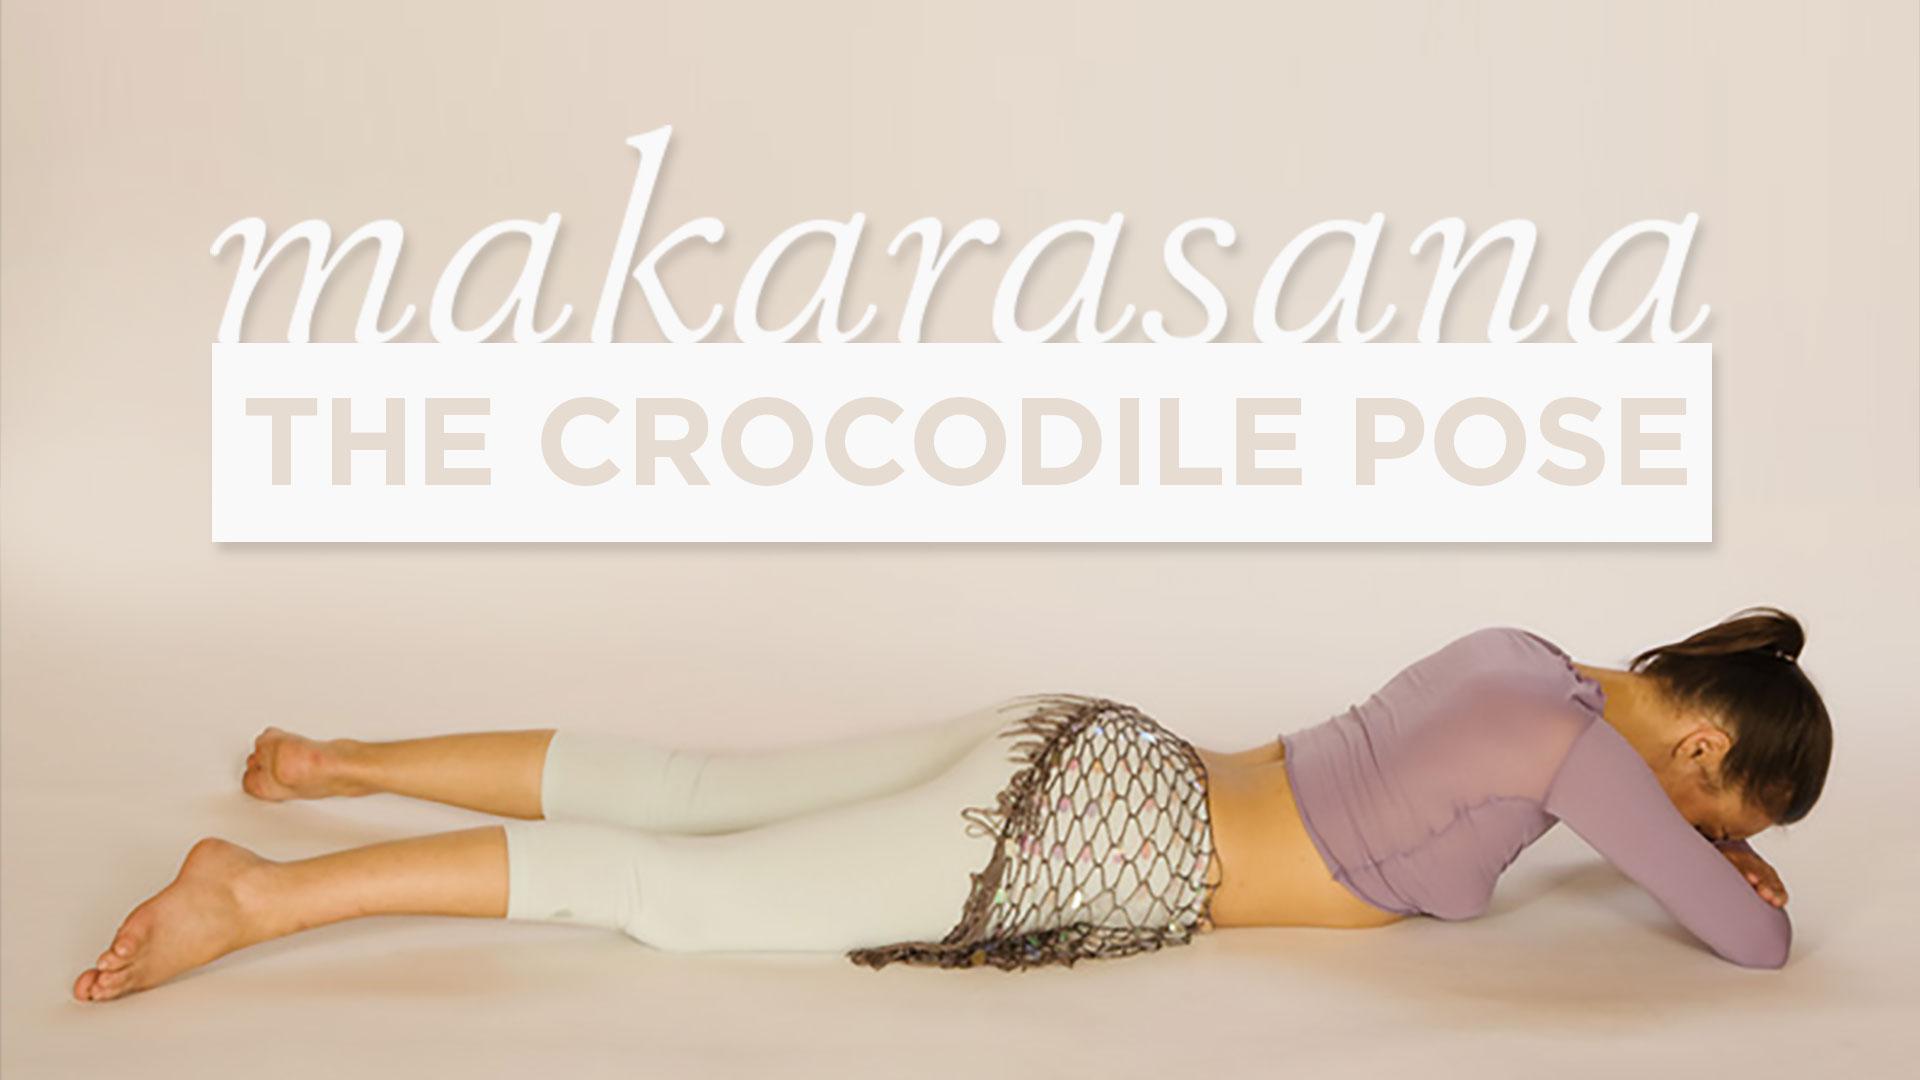 Makarasana  The Crocodile Pose